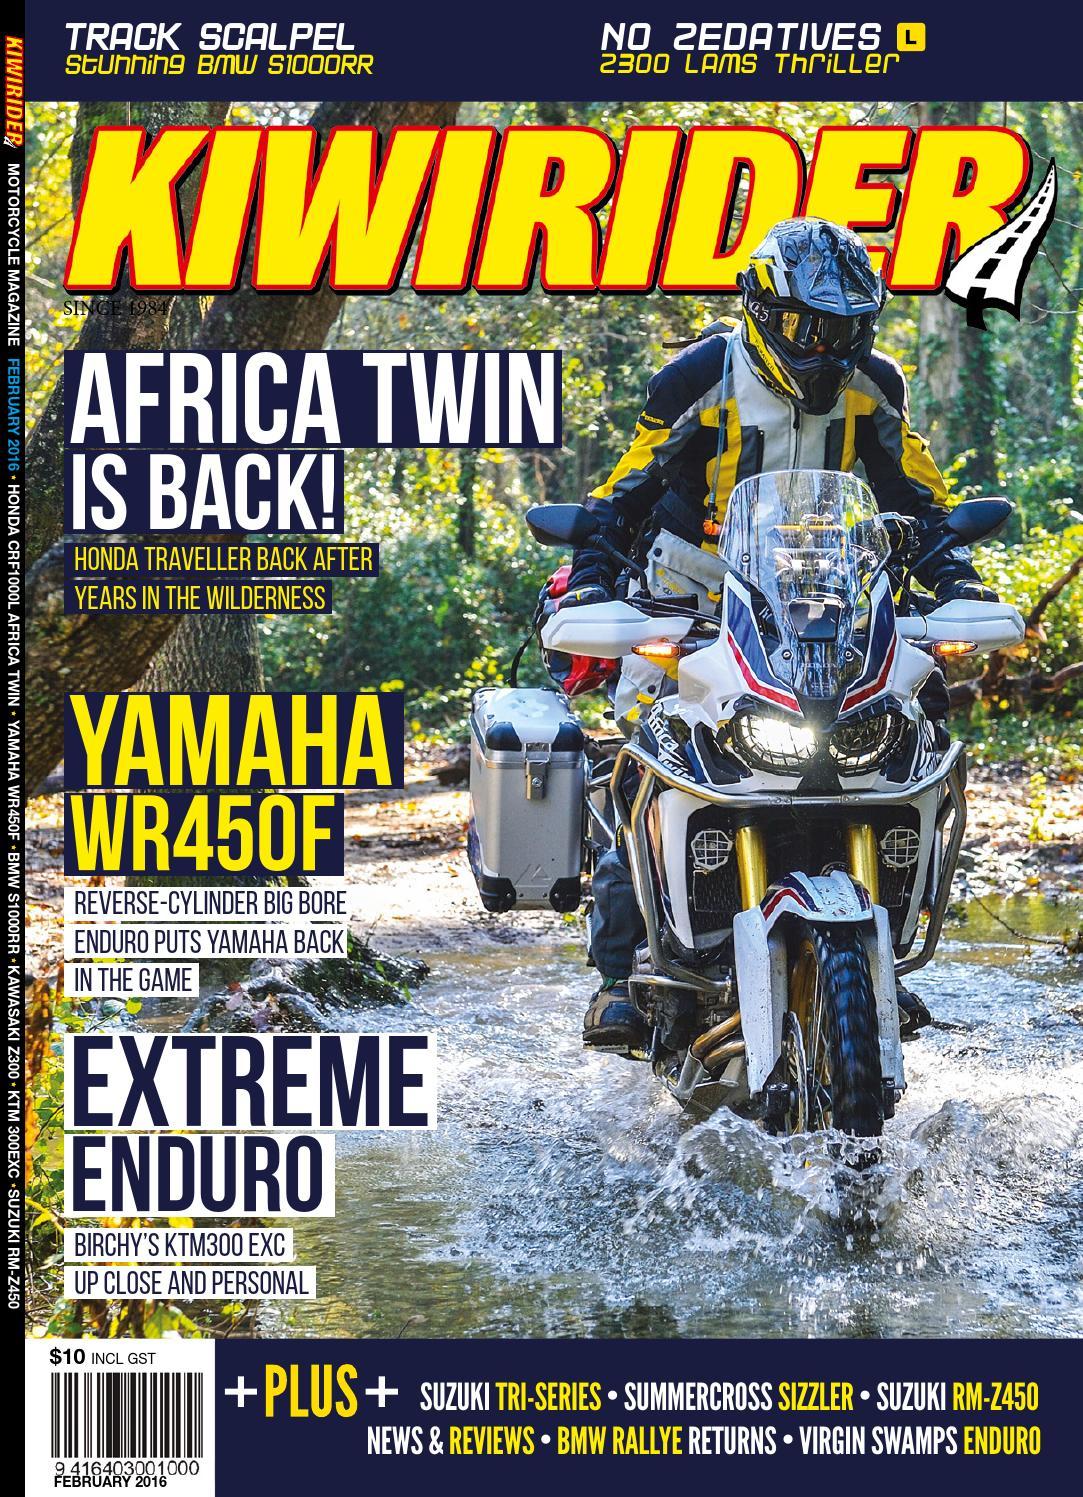 DRC Wide Lift up Motocross MX Bike Stand for Husqvarna TX 125 for sale online